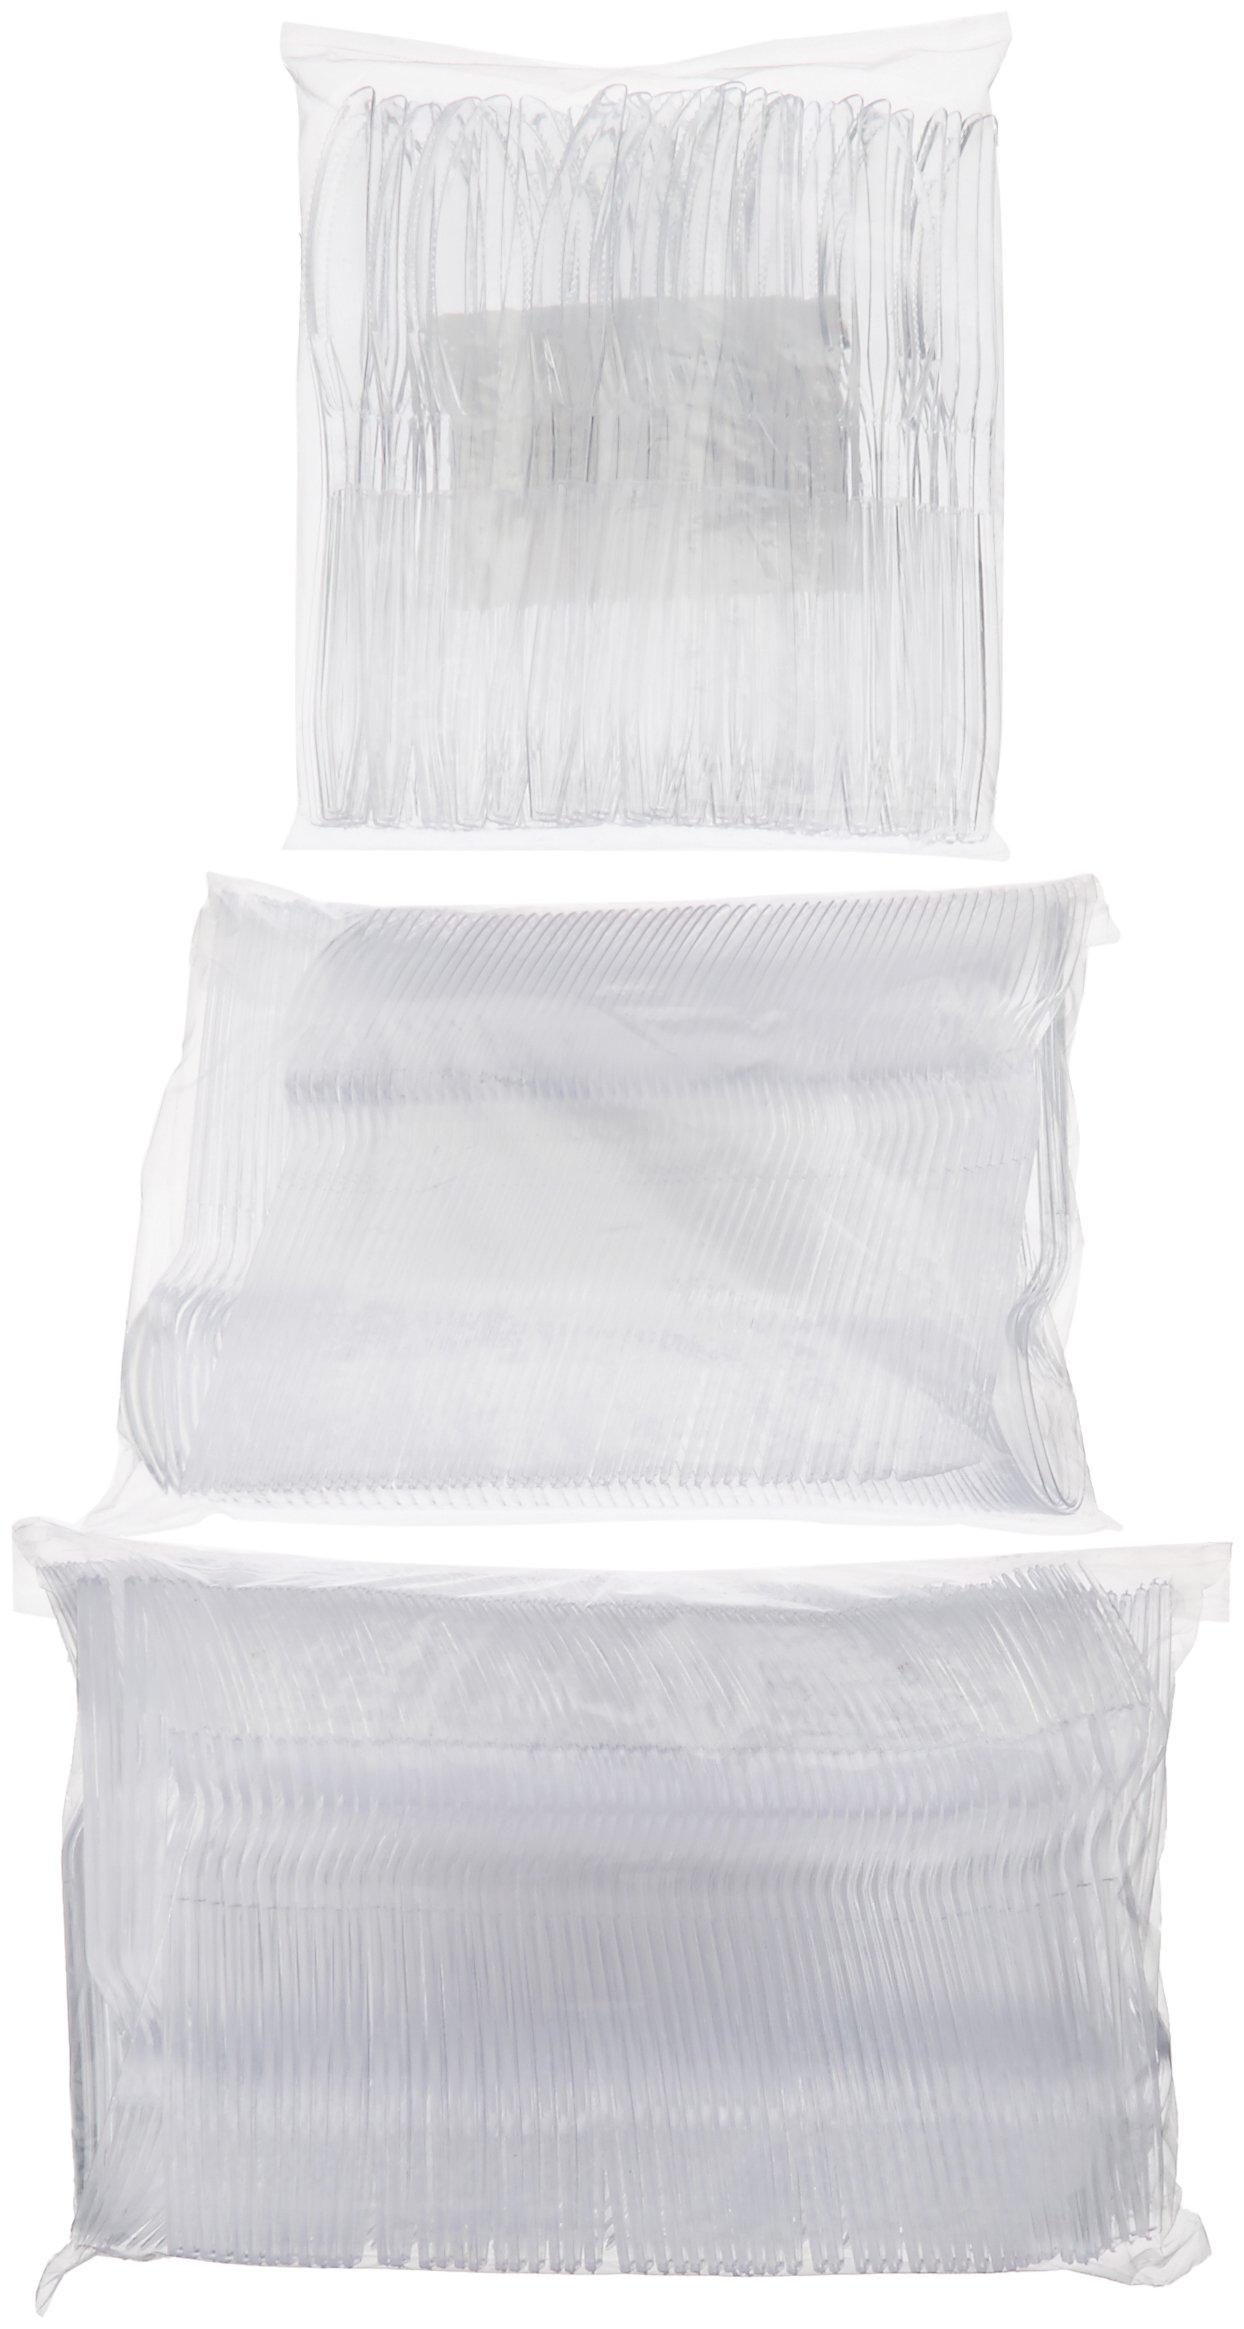 AmazonBasics 1,800-Piece Clear Plastic Cutlery Set by AmazonBasics (Image #5)